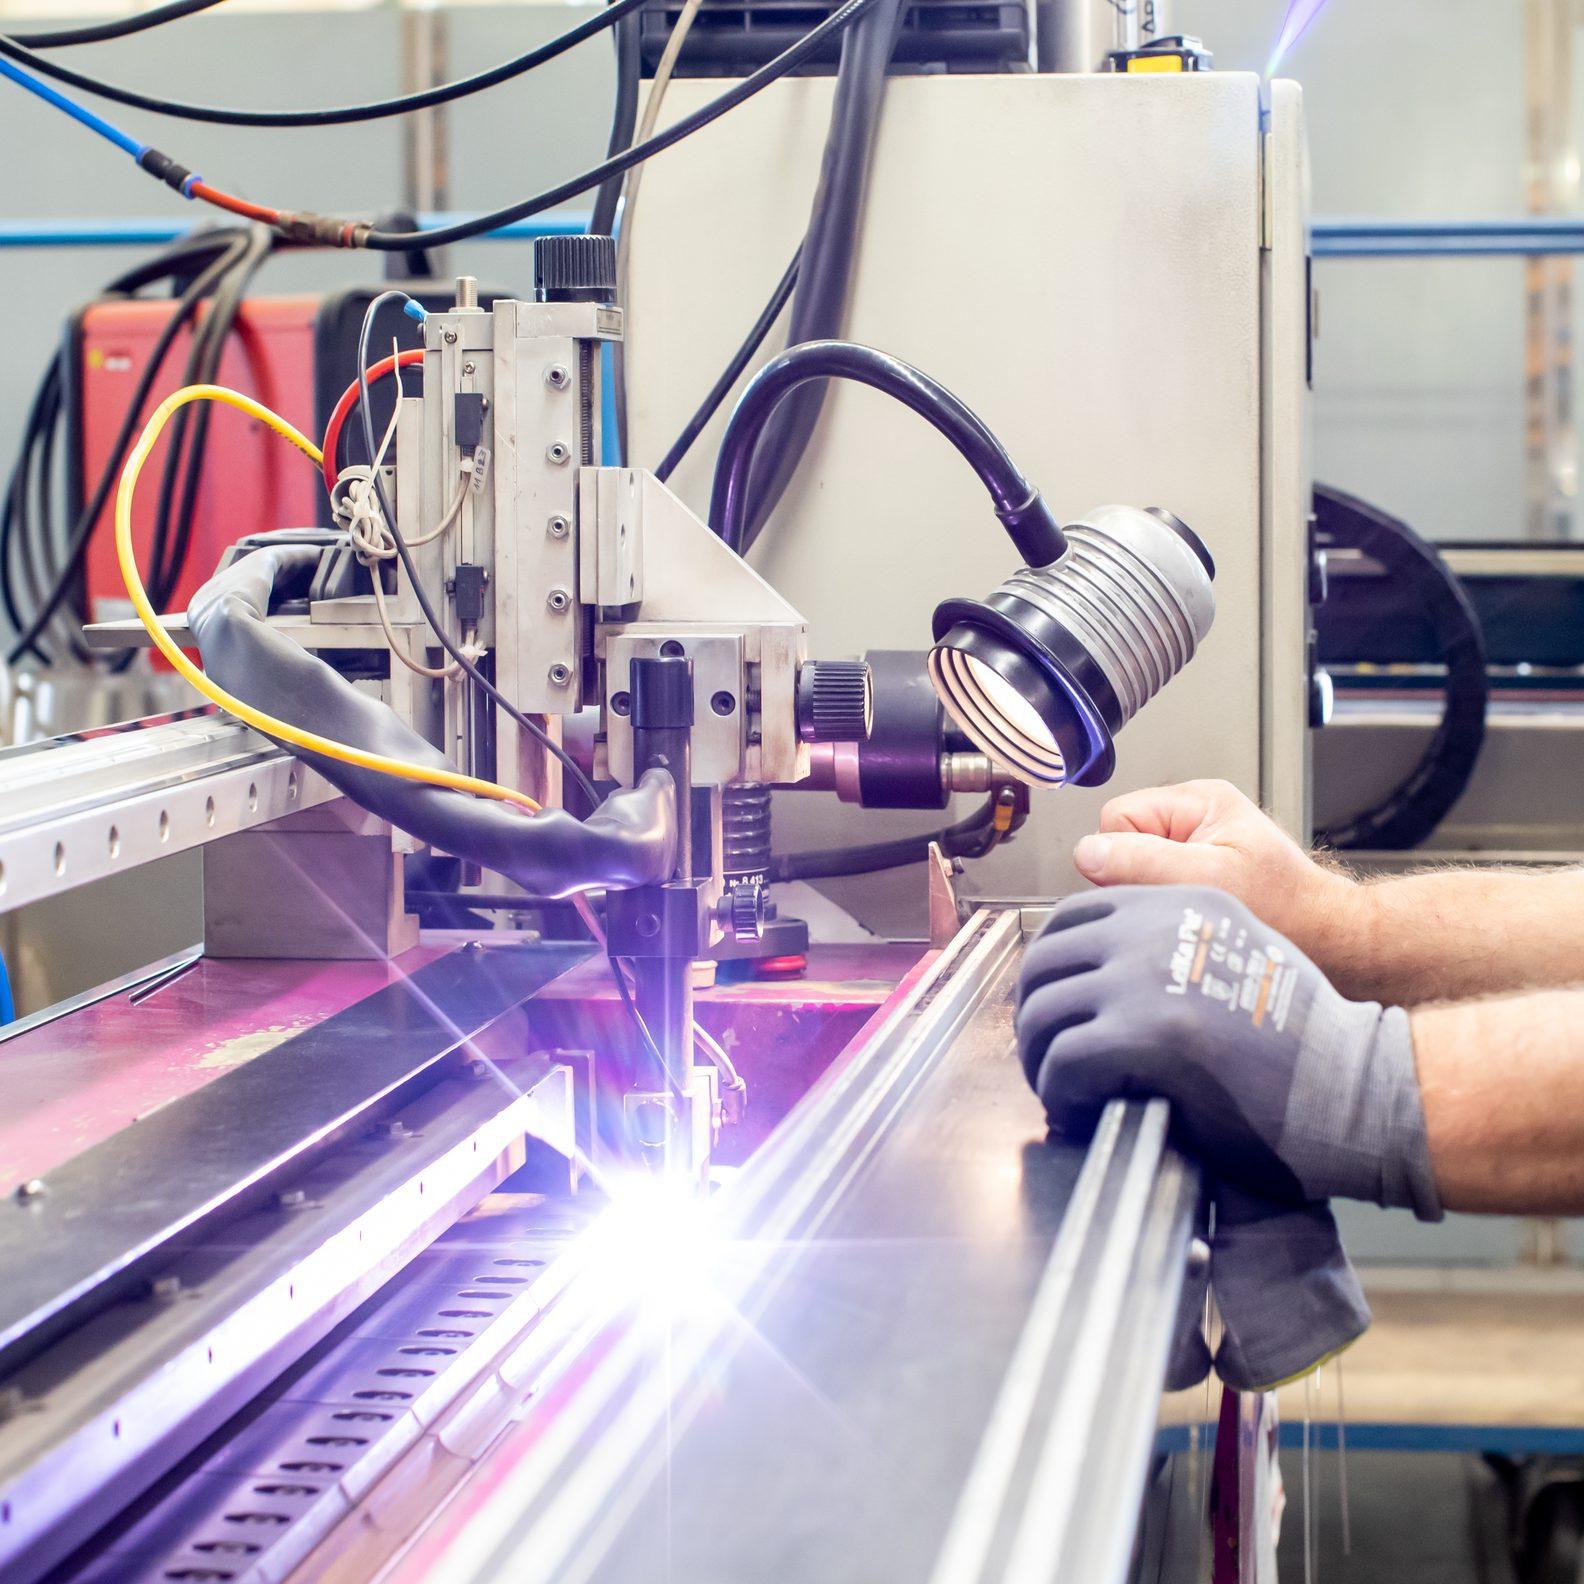 ERO Edelstahl-Rohrtechik GmbH